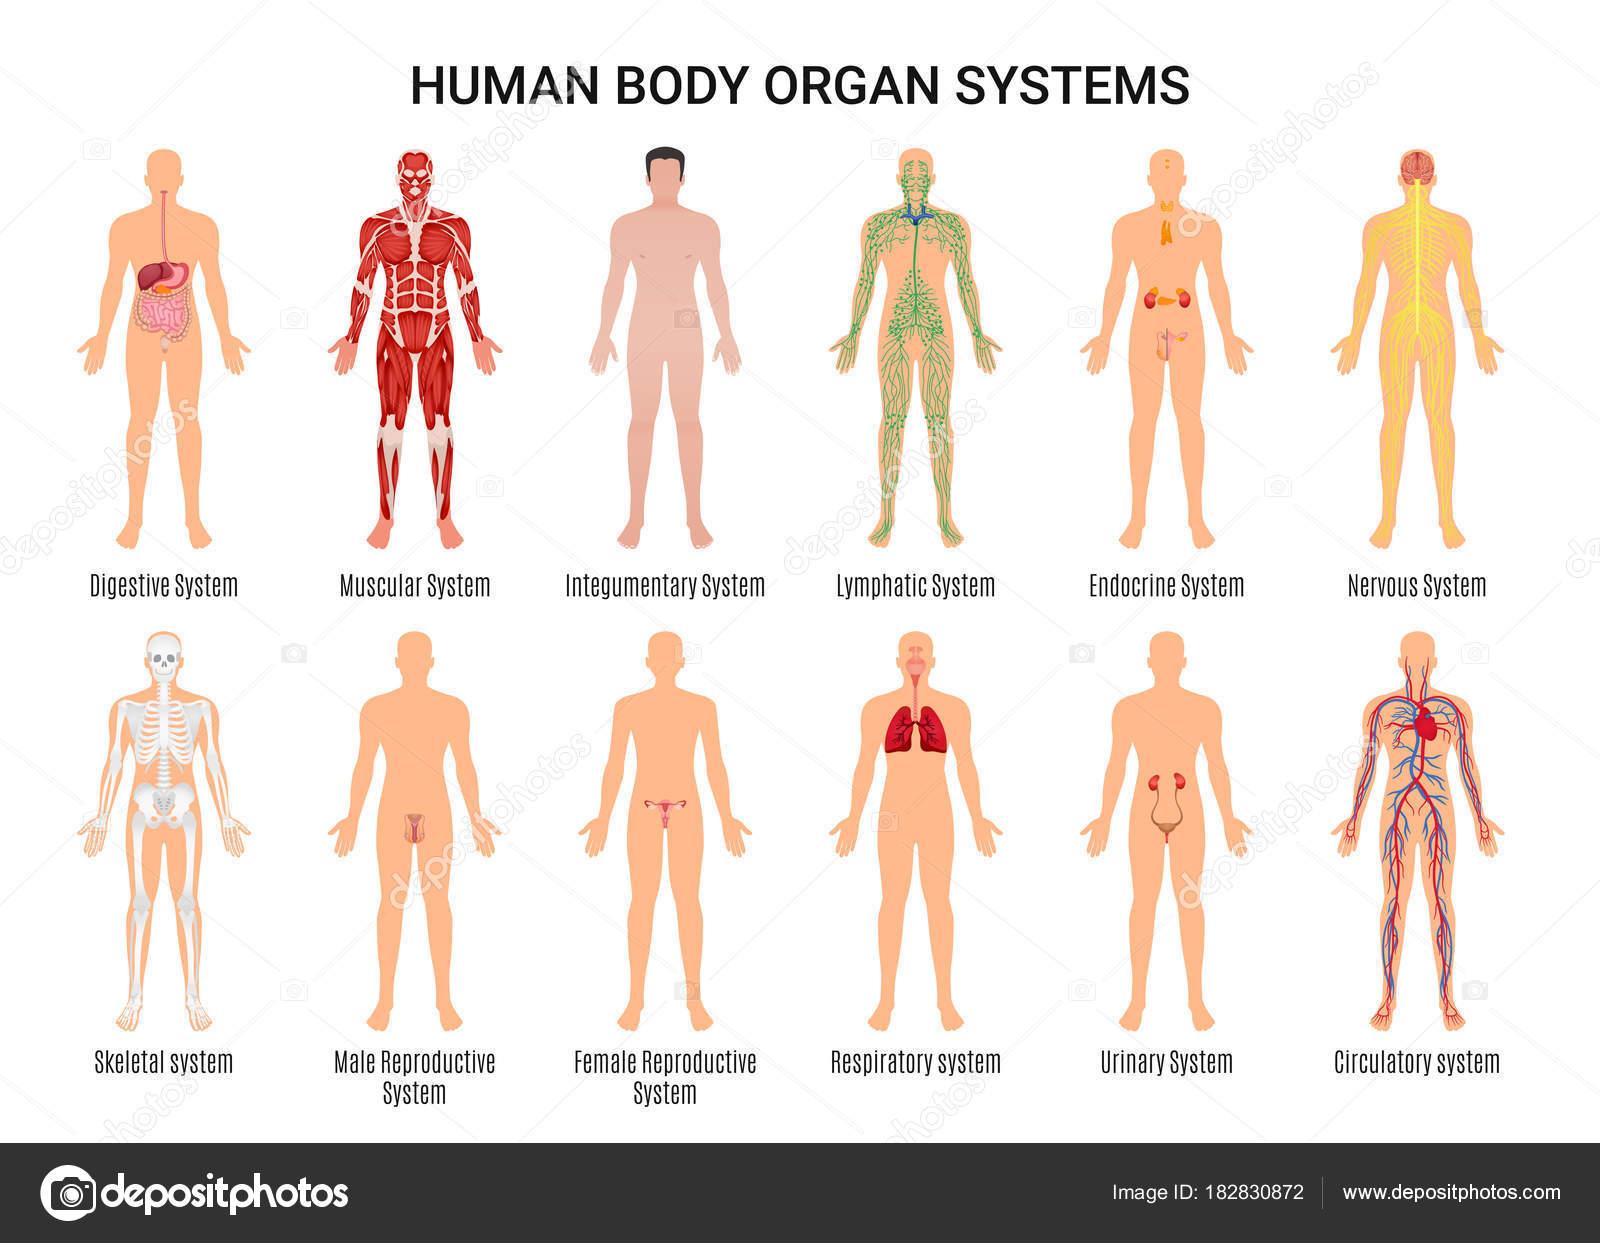 Human Body Organ Systems Poster — Stock Vector © macrovector #182830872